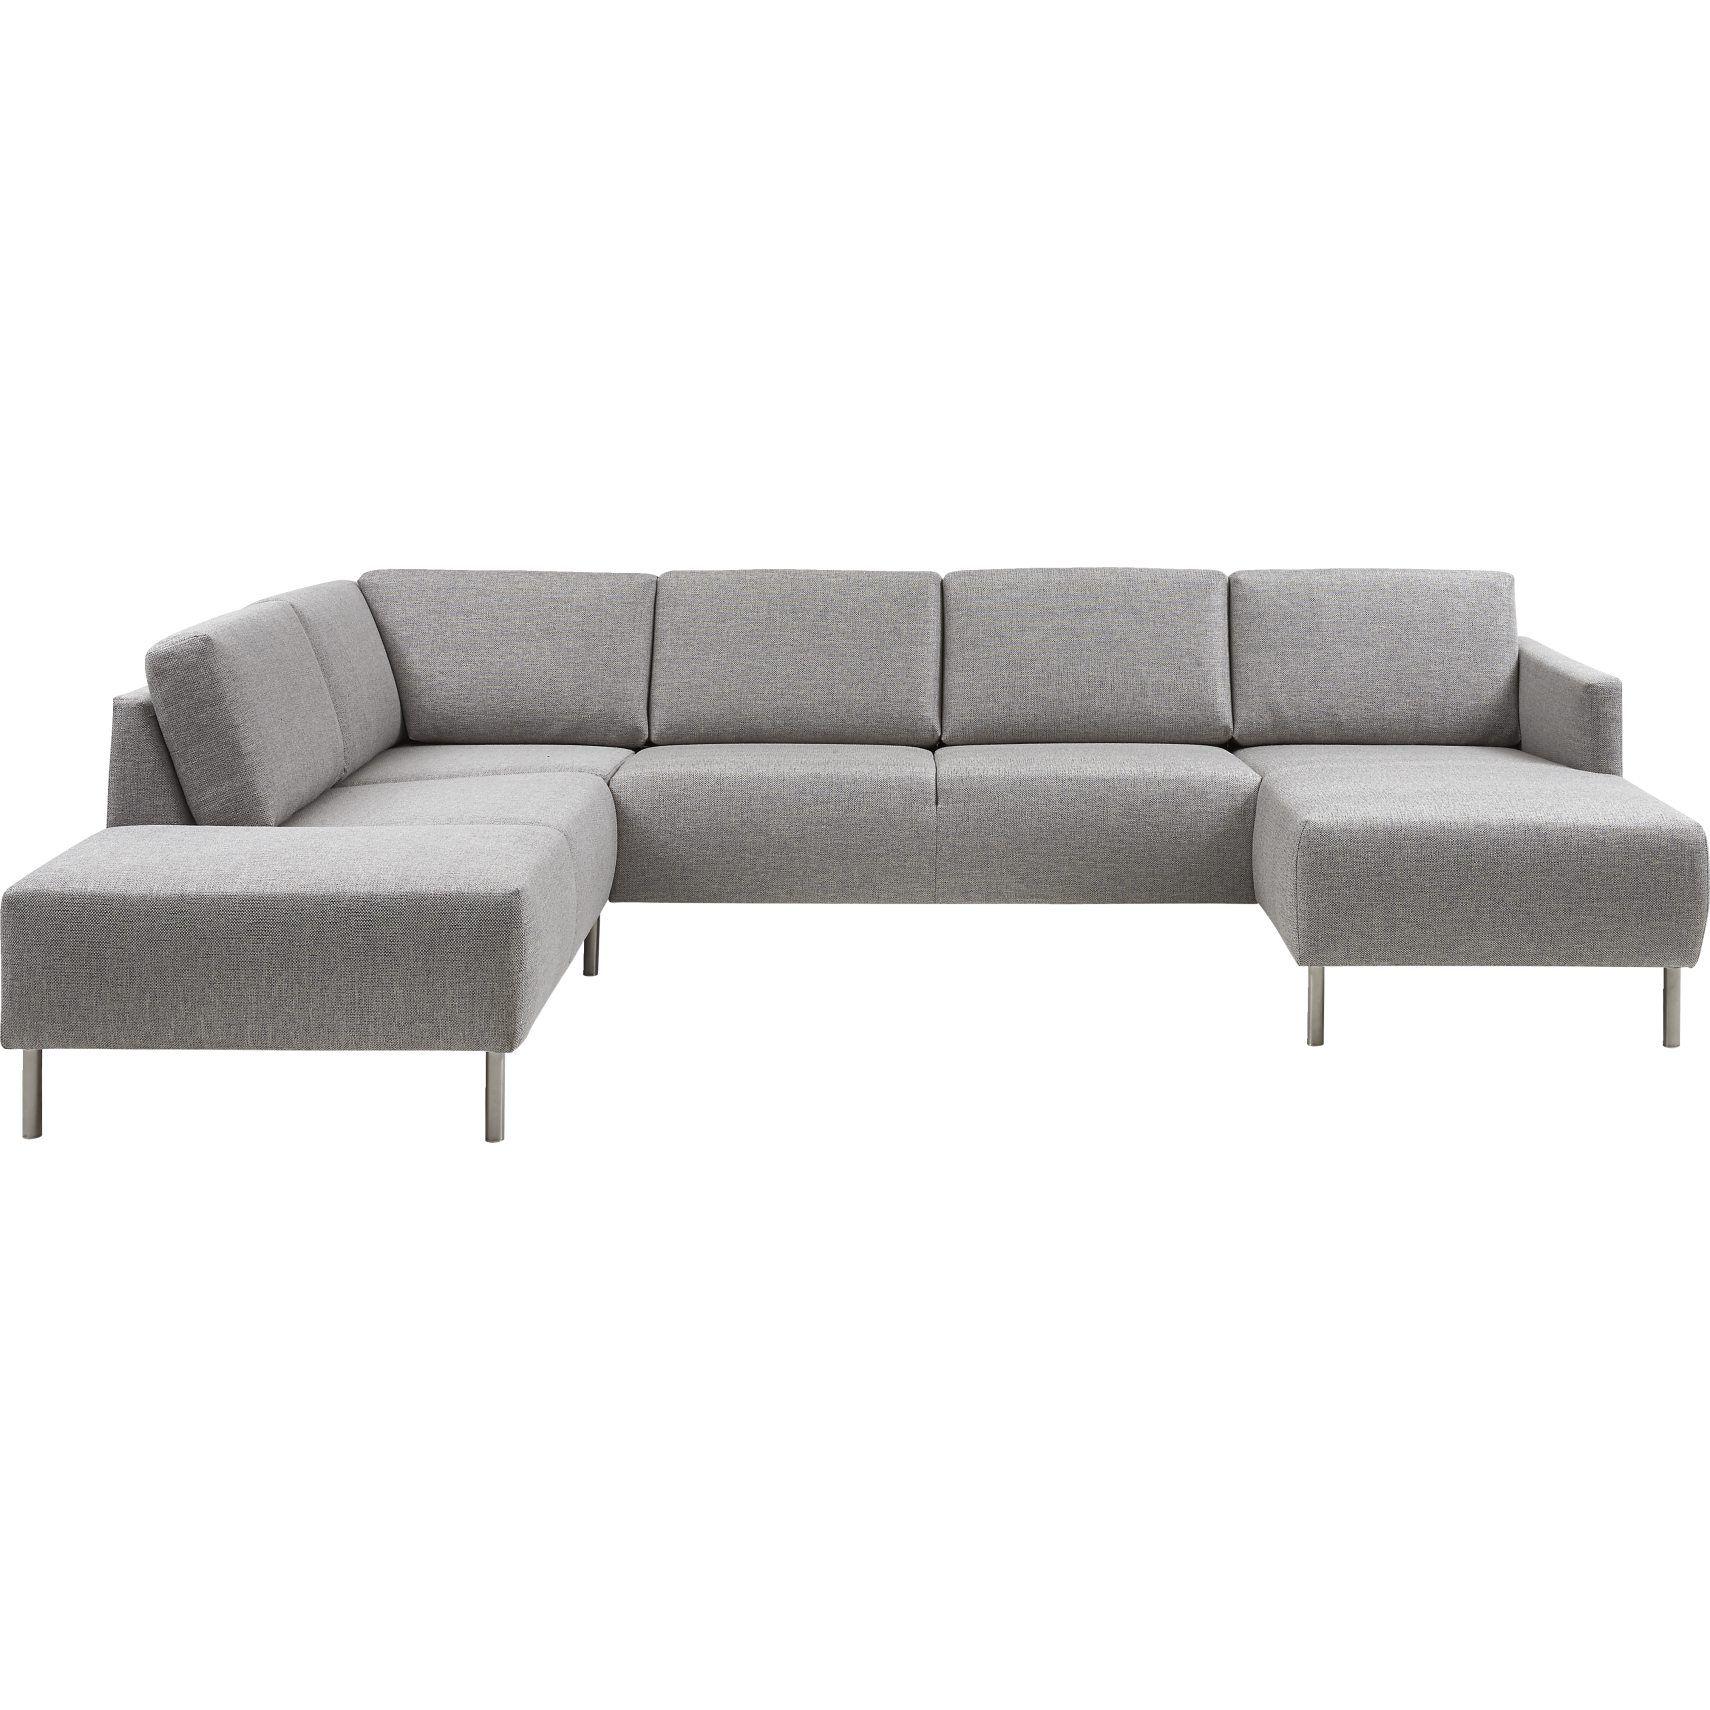 Flavio sofa